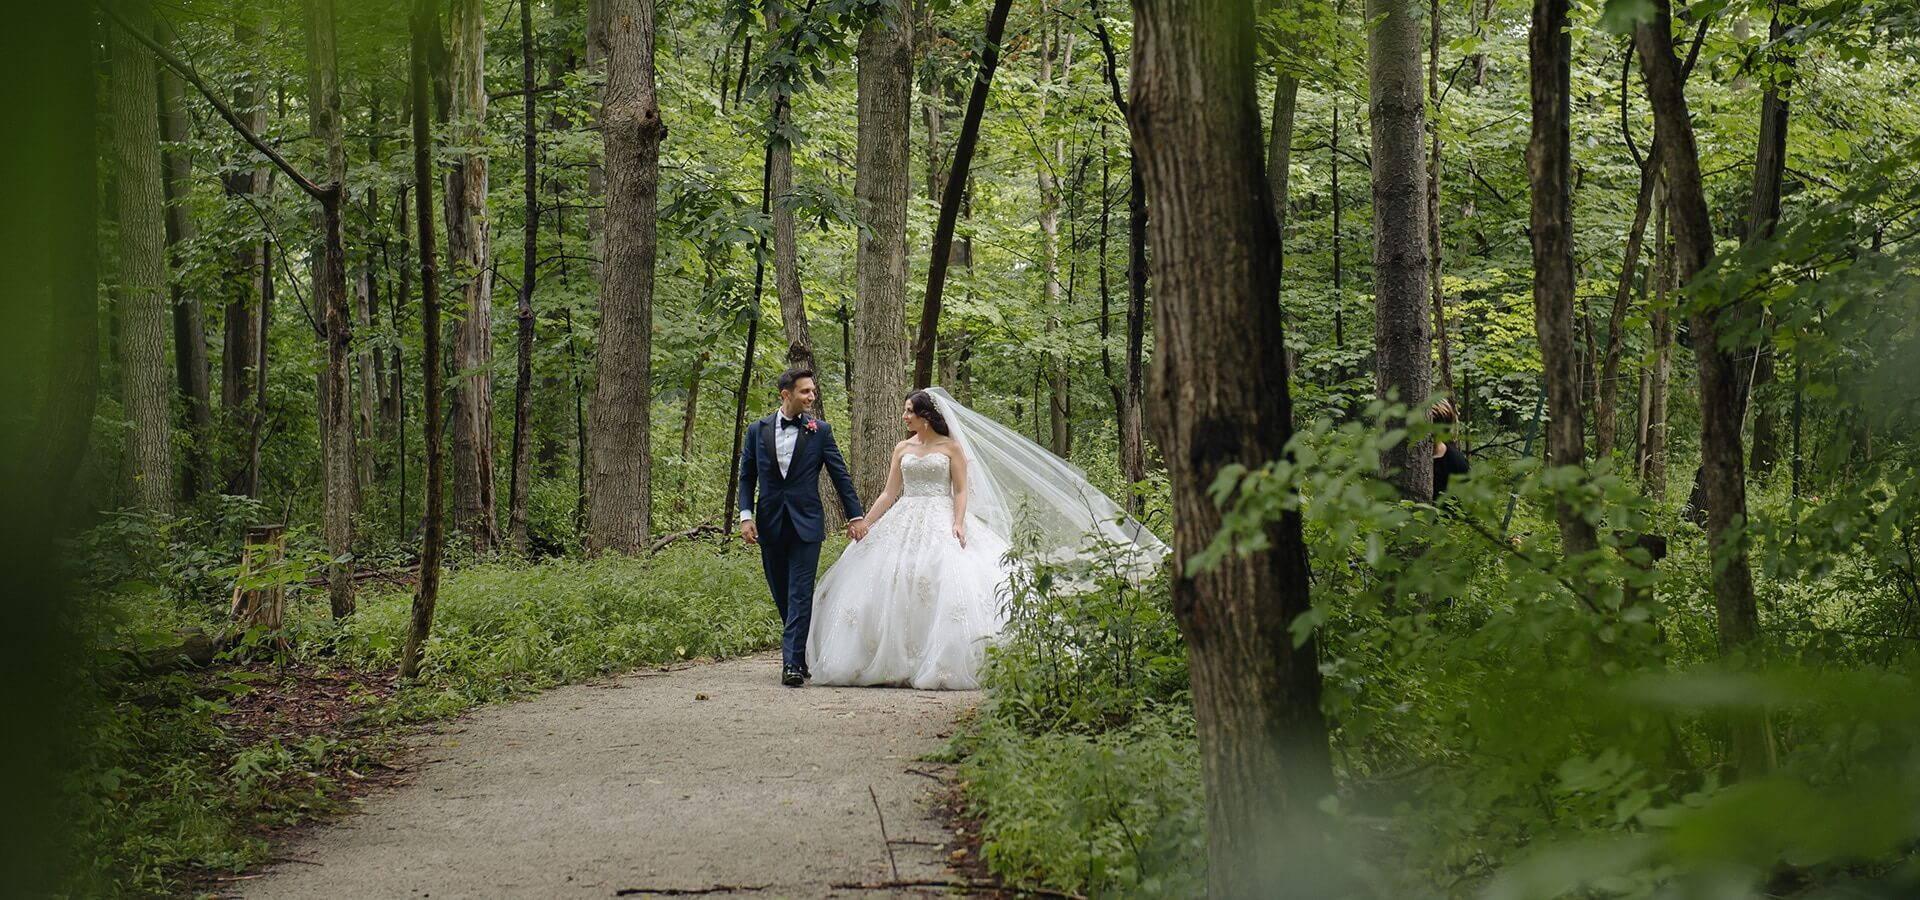 Hero image for Joanna and Giampiero's Elegant Wedding at The Royalton